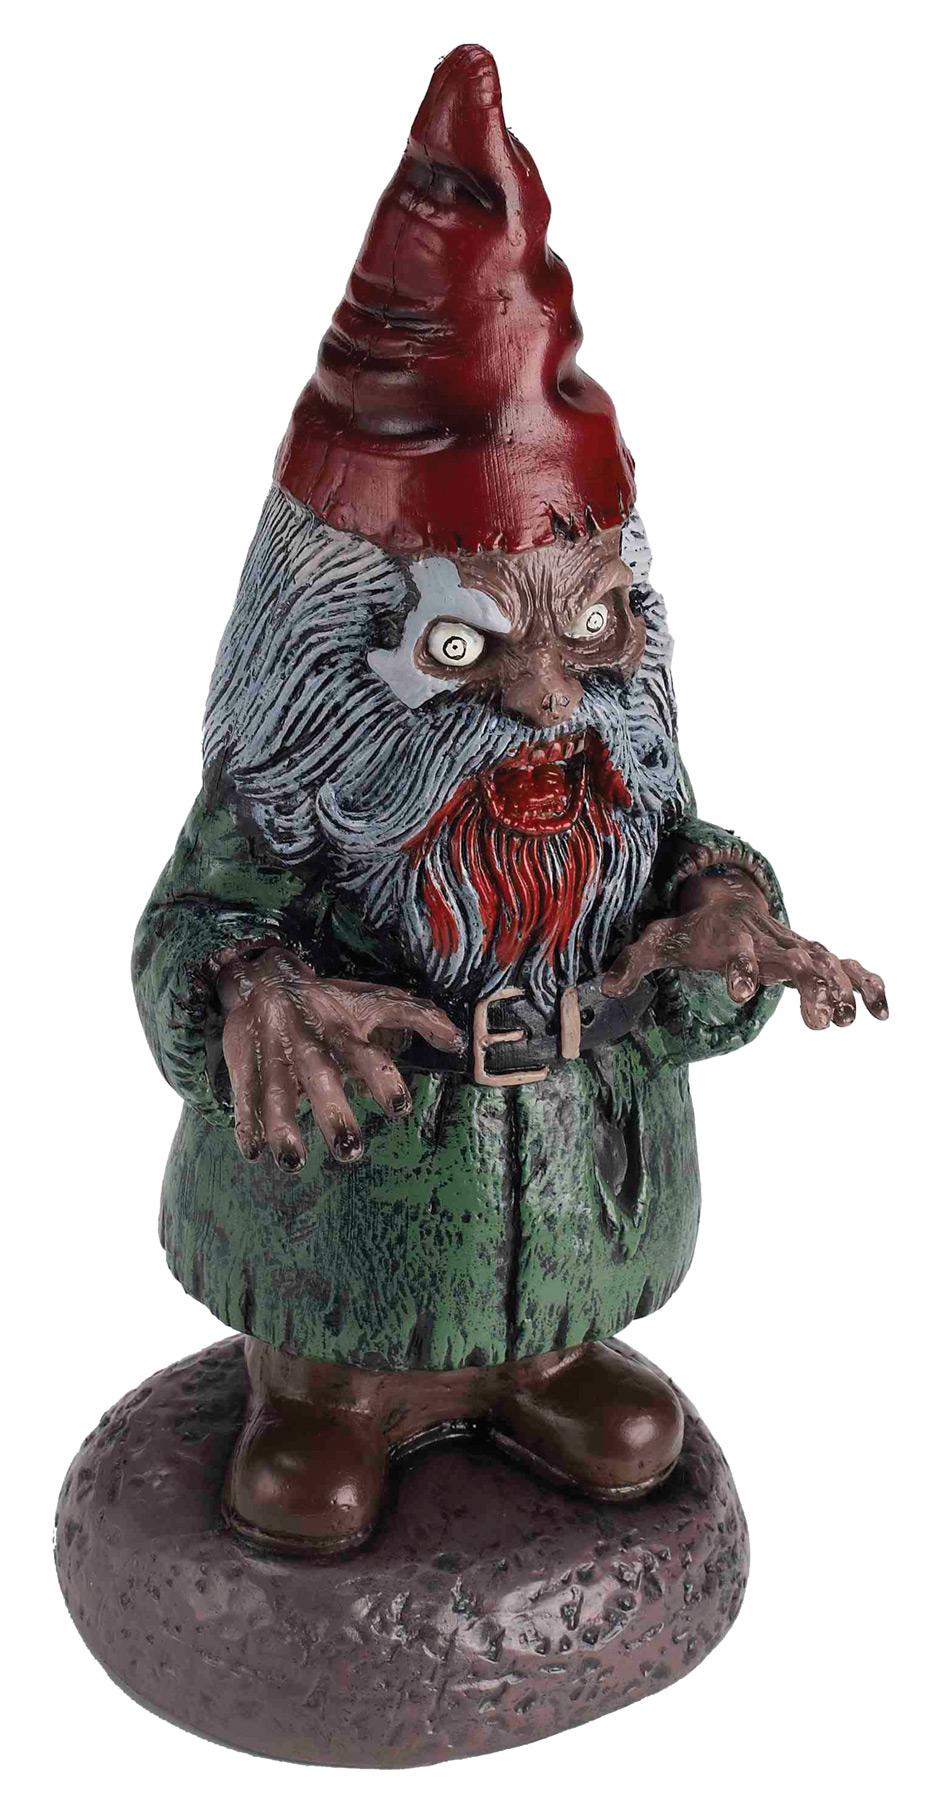 Gnome In Garden: Zombie Garden Gnome Decoration